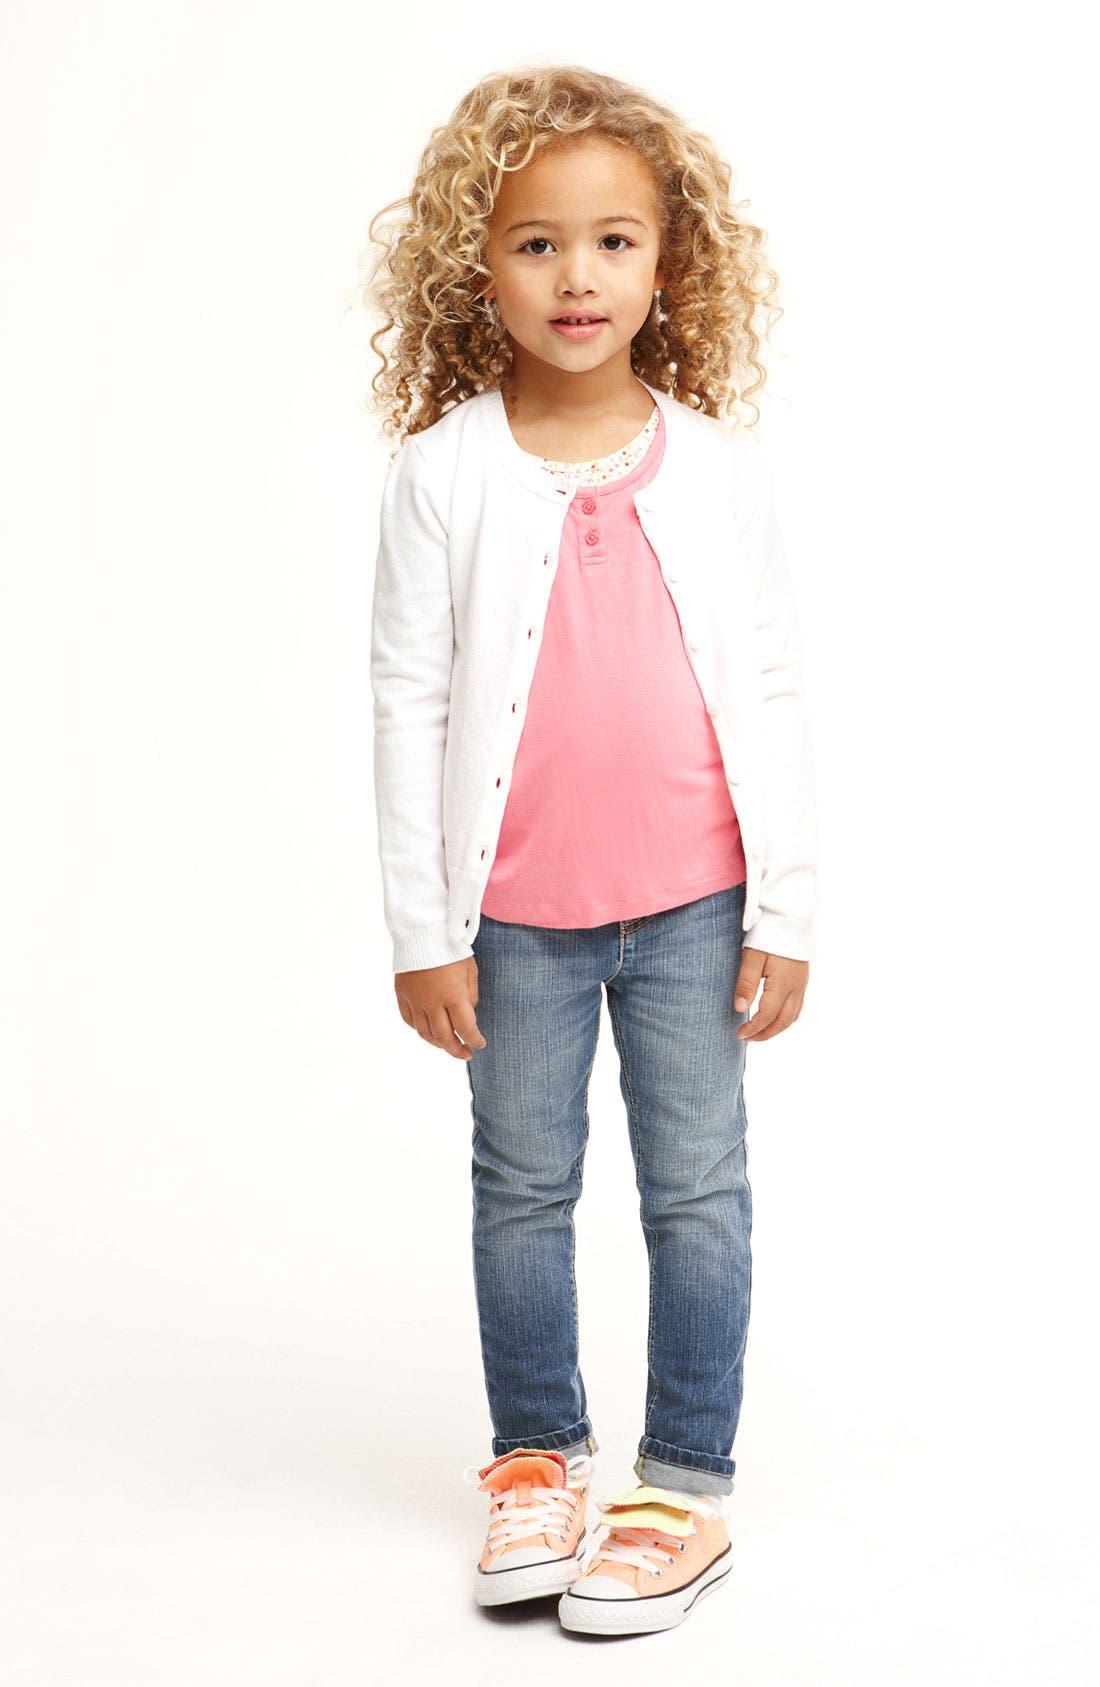 Main Image - Tucker + Tate Tank Top, Cardigan & Skinny Jeans & Converse Sneaker (Little Girls)